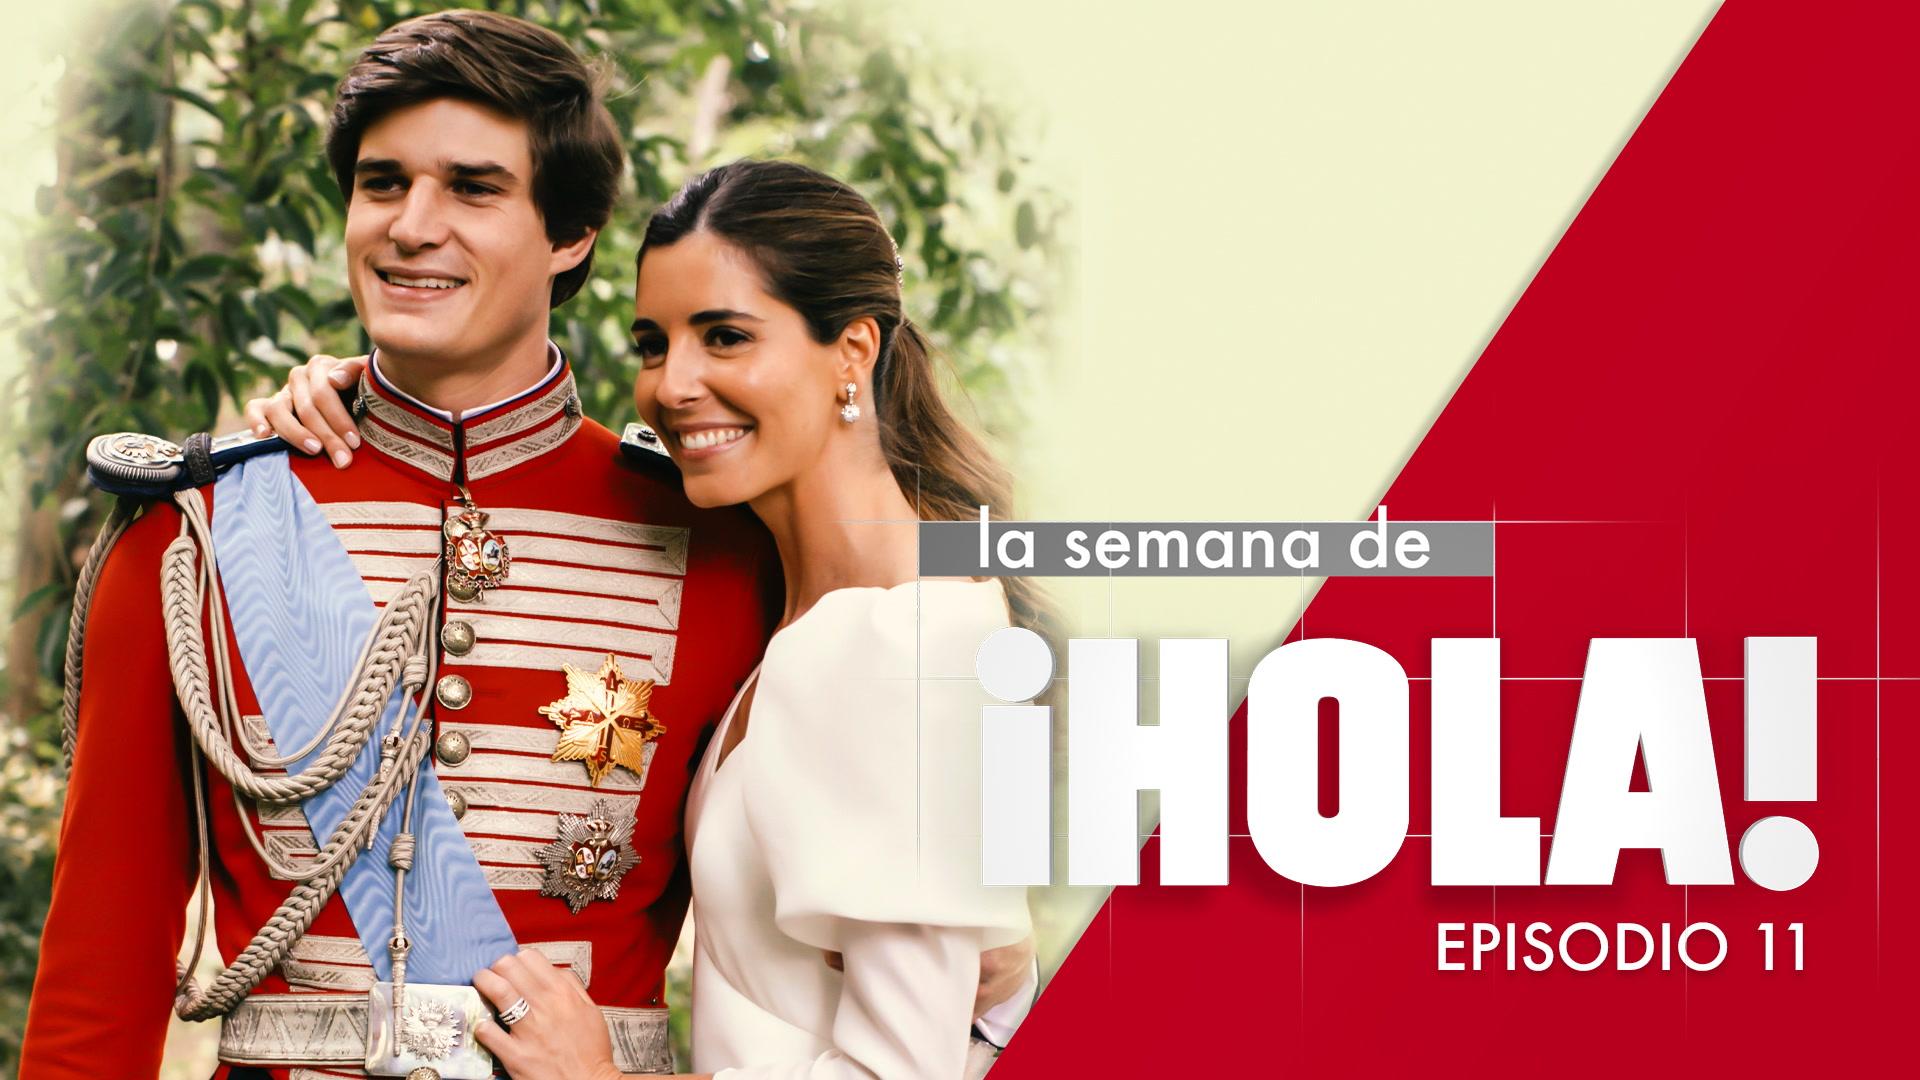 La semana de ¡HOLA! - Episodio 11